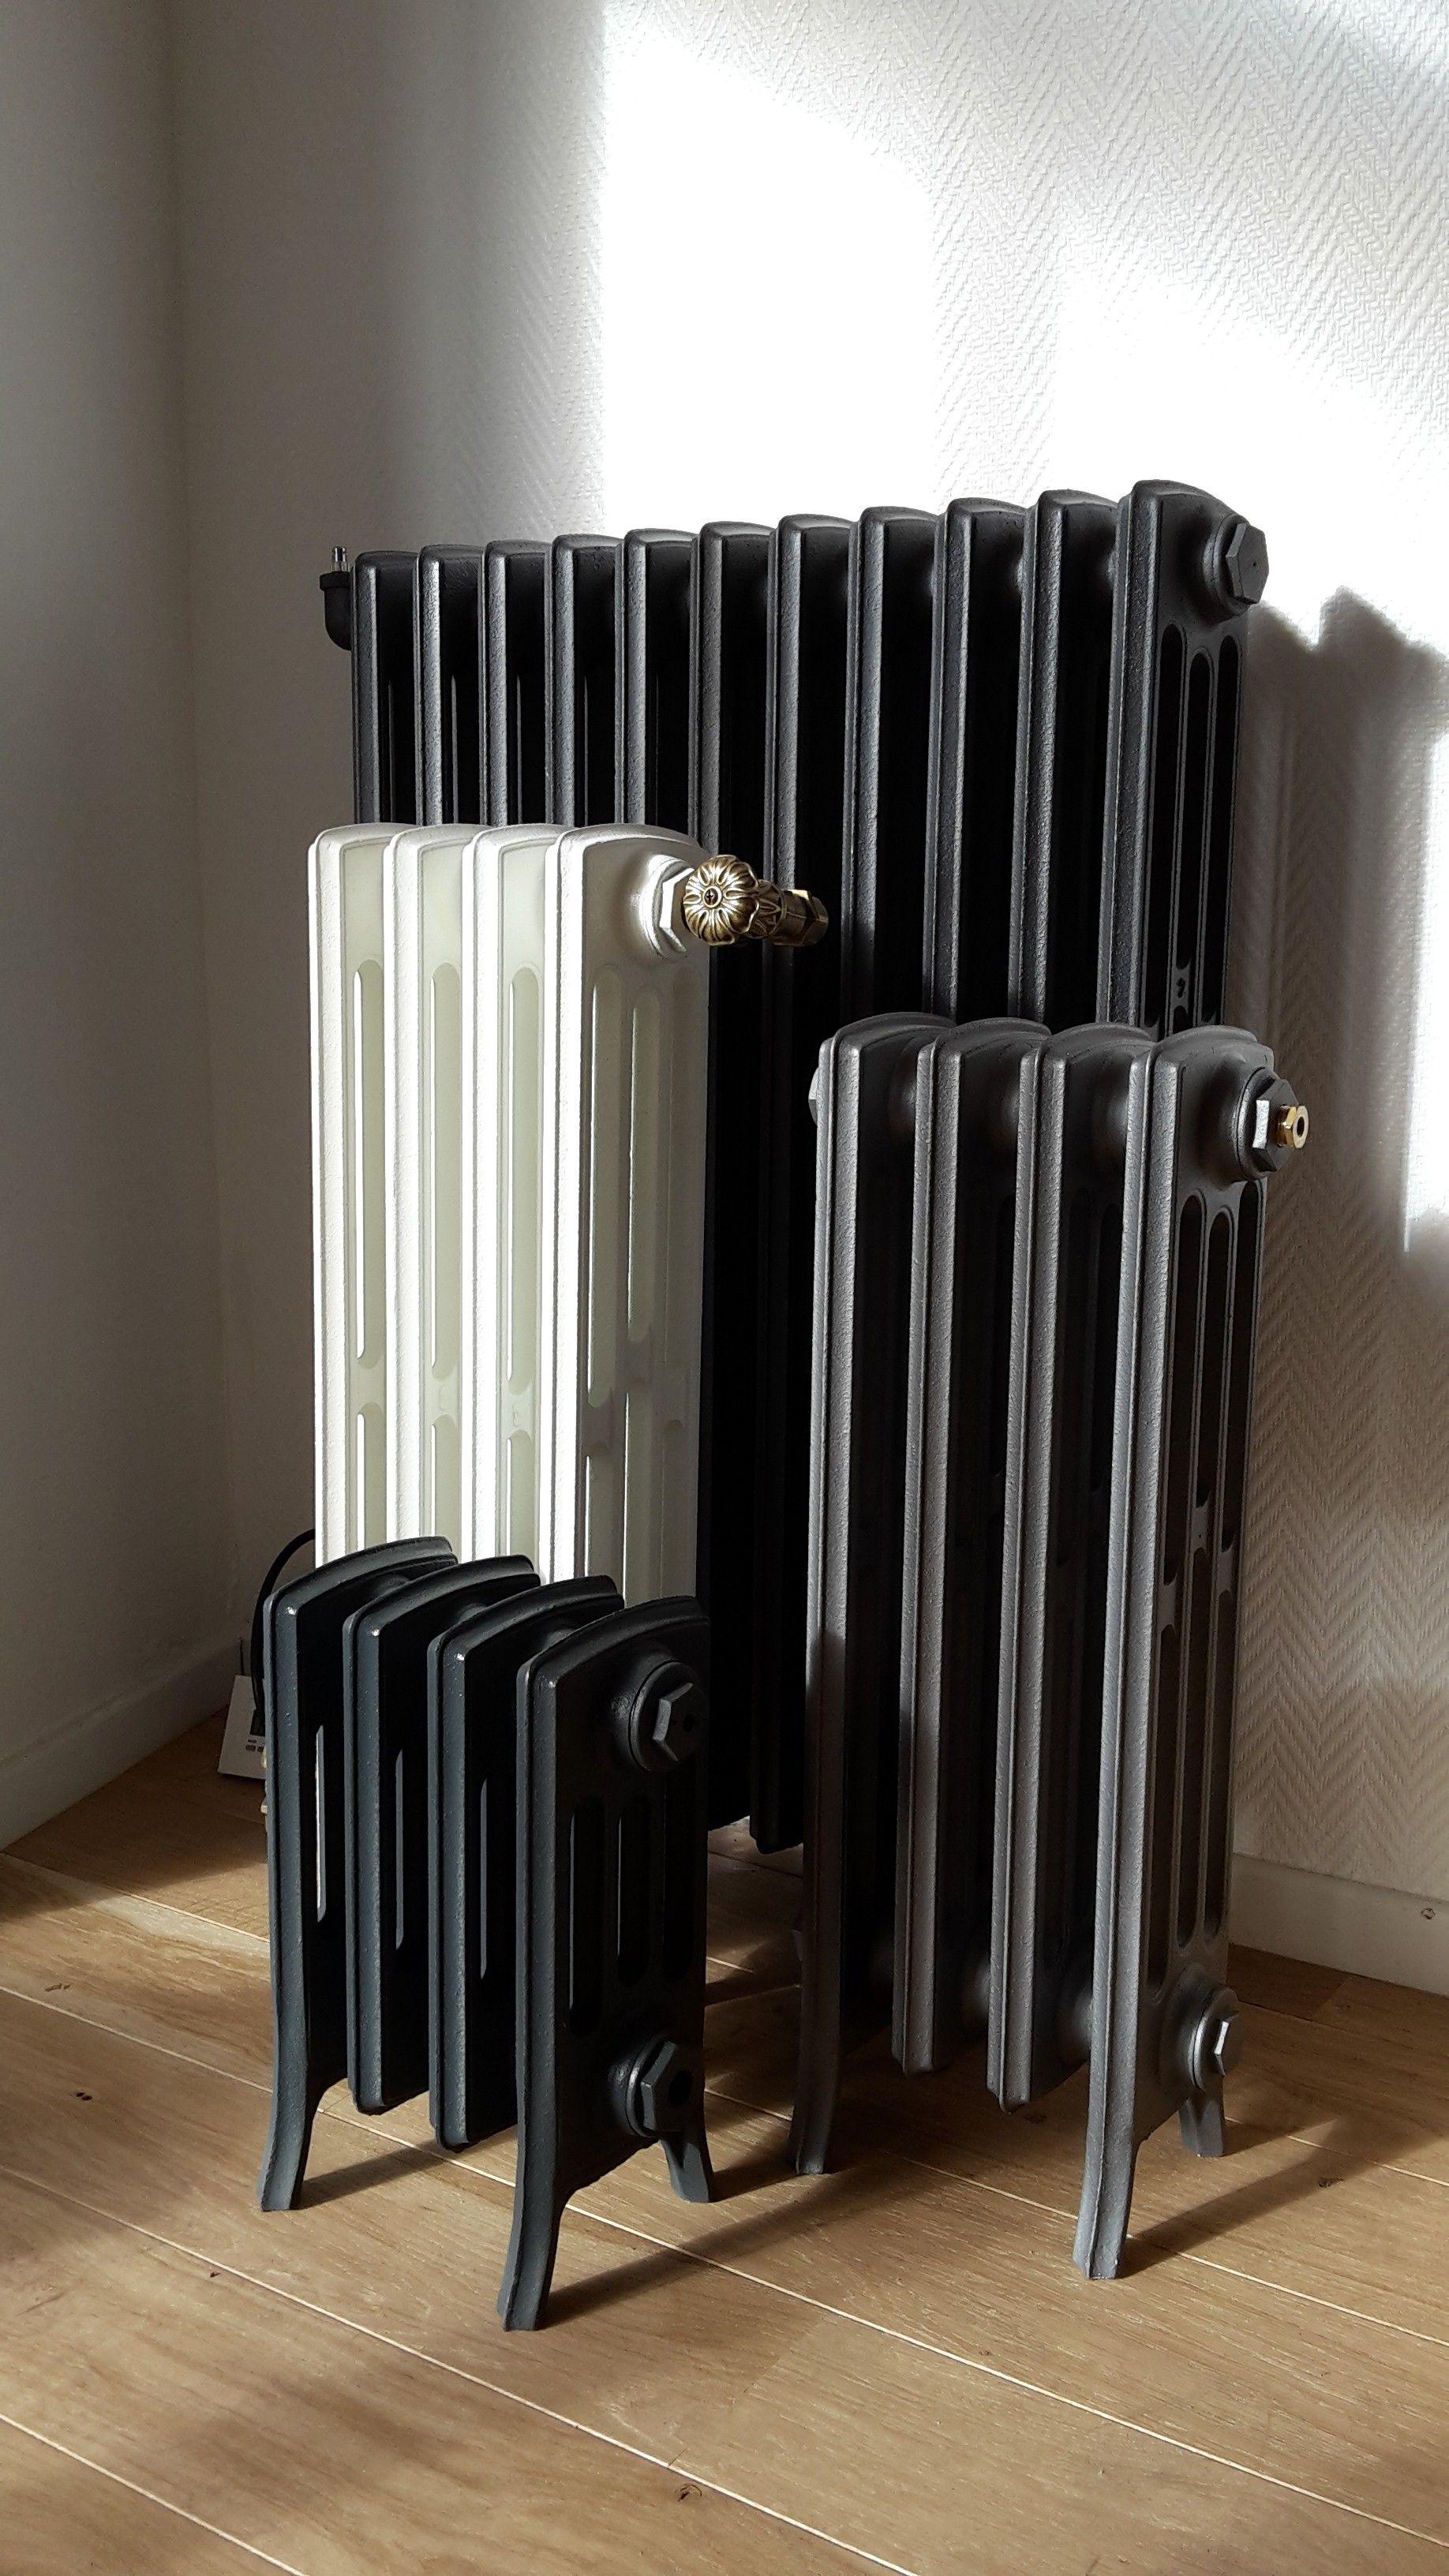 changer un radiateur en fonte gallery of merci de votre aide with changer un radiateur en fonte. Black Bedroom Furniture Sets. Home Design Ideas